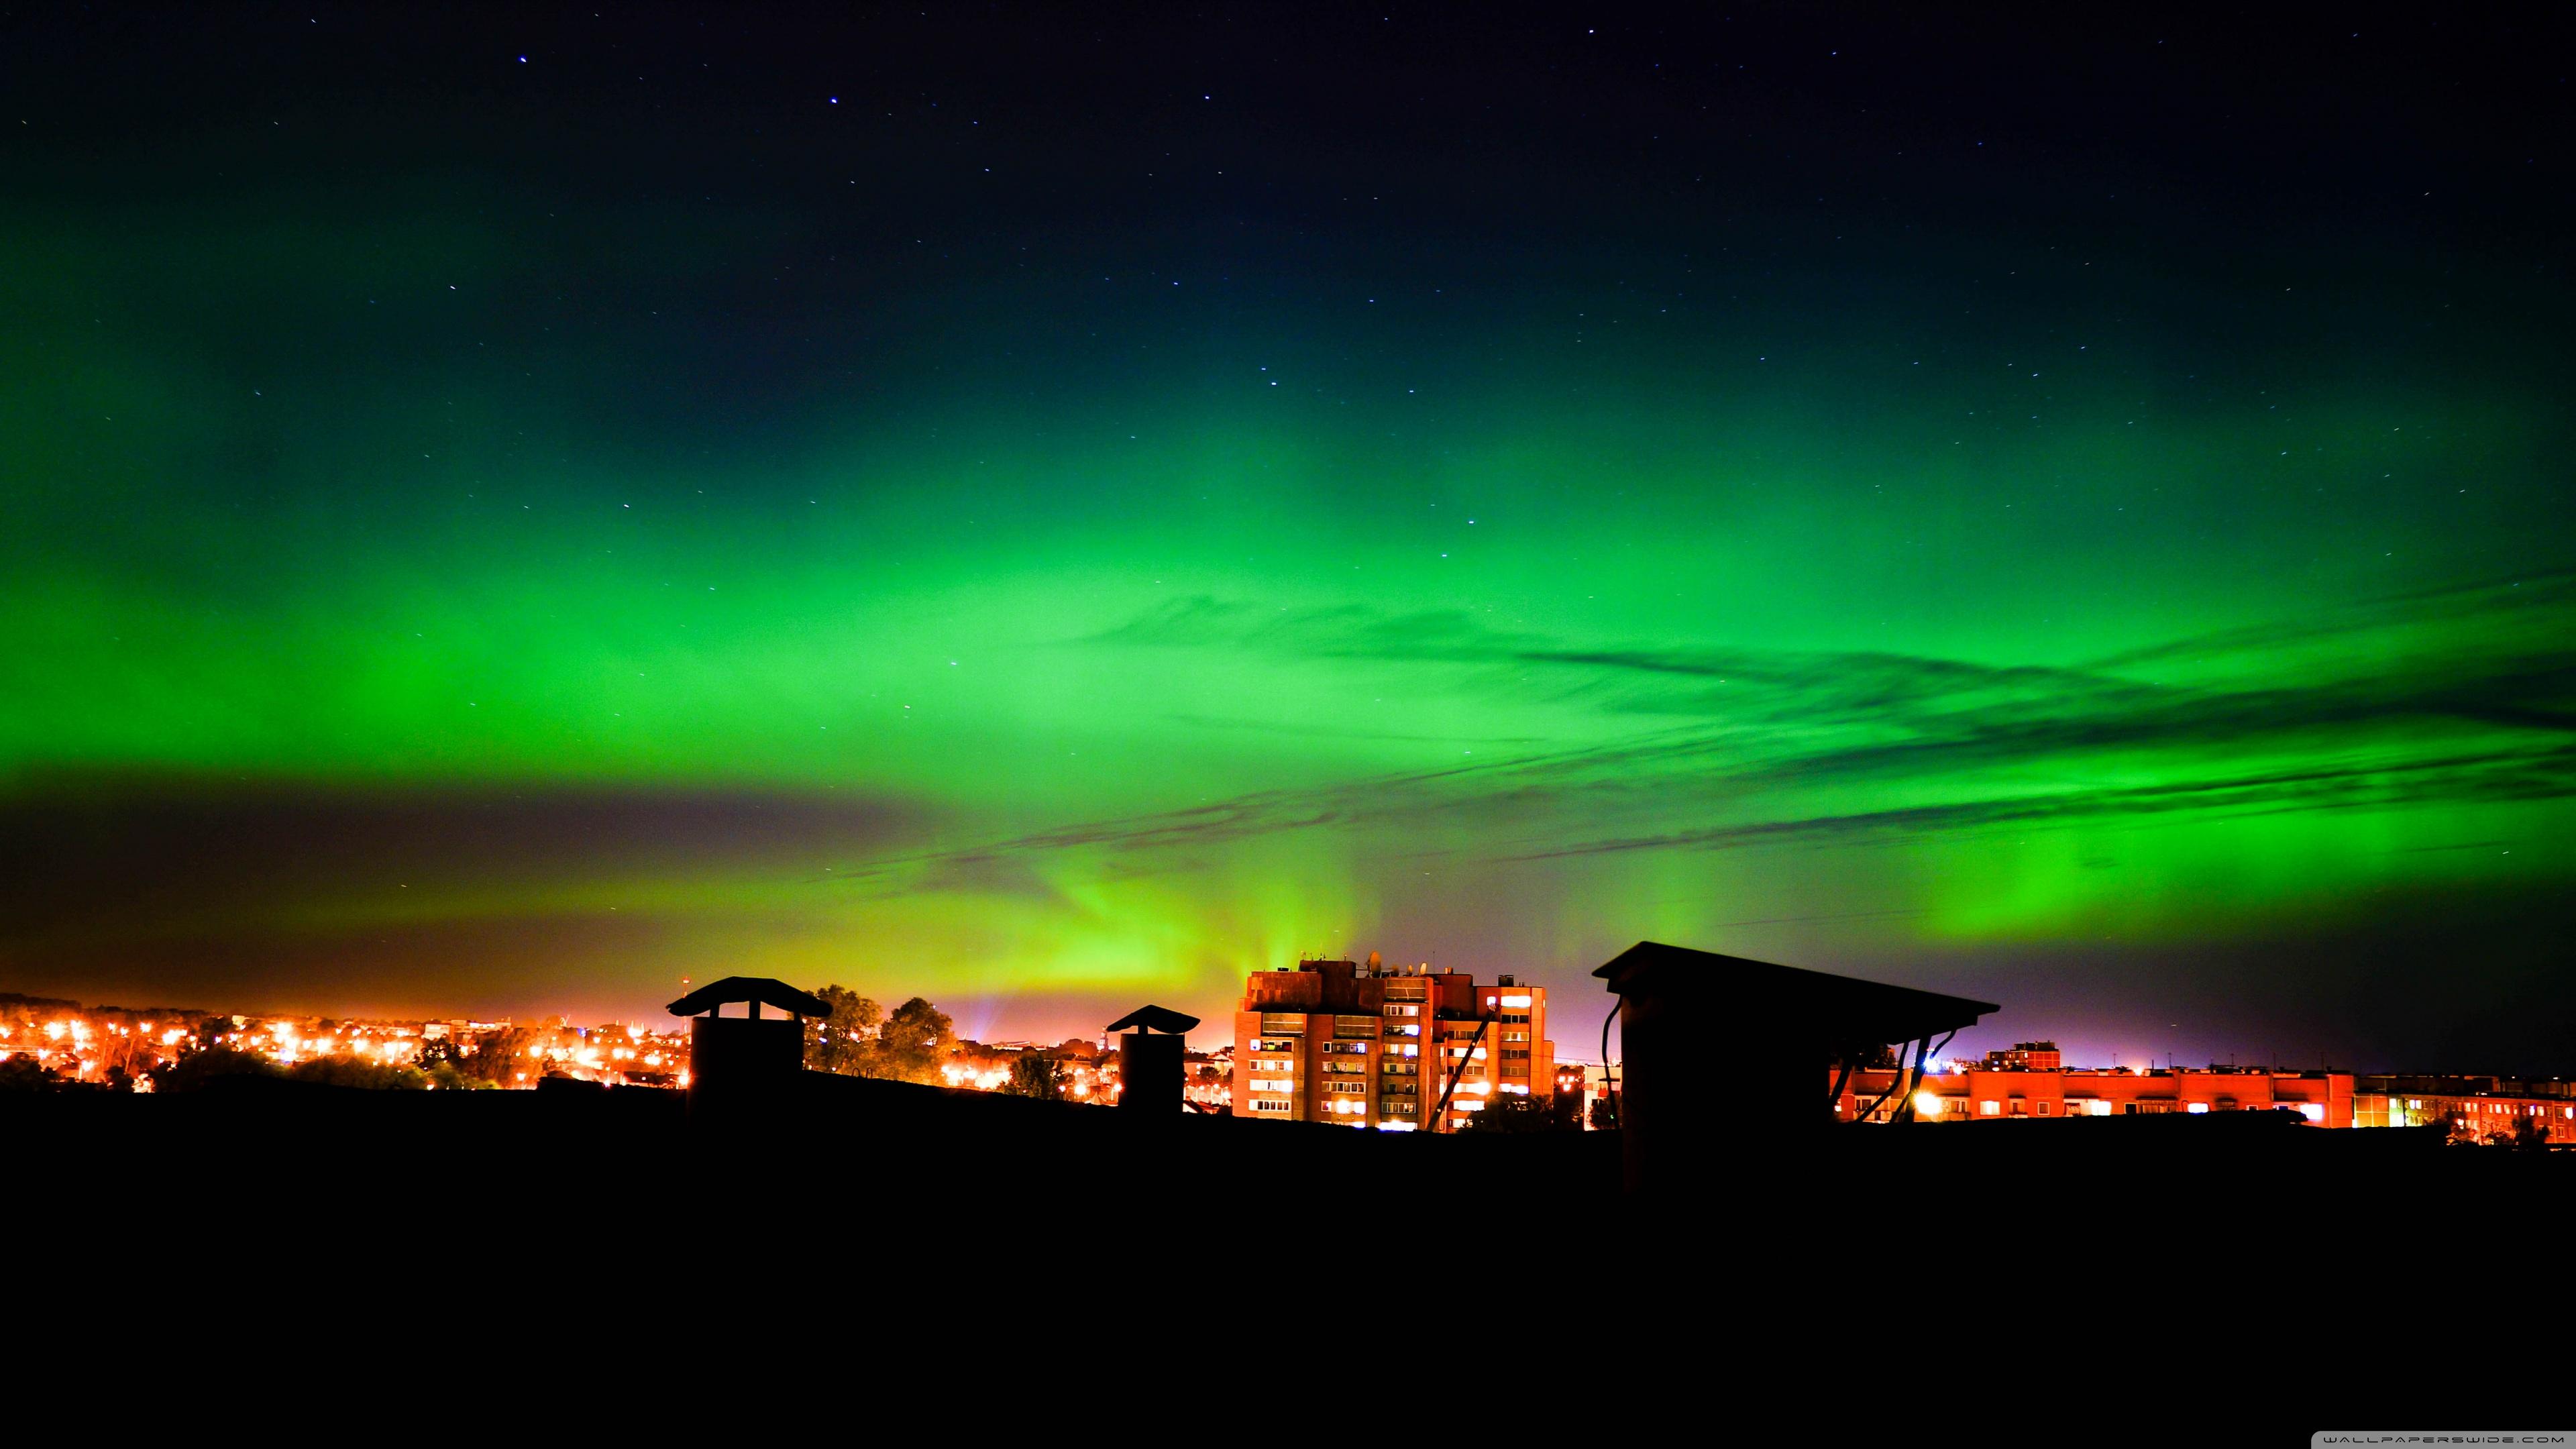 Free Download Northern Lights Aurora Borealis 4k Hd Desktop